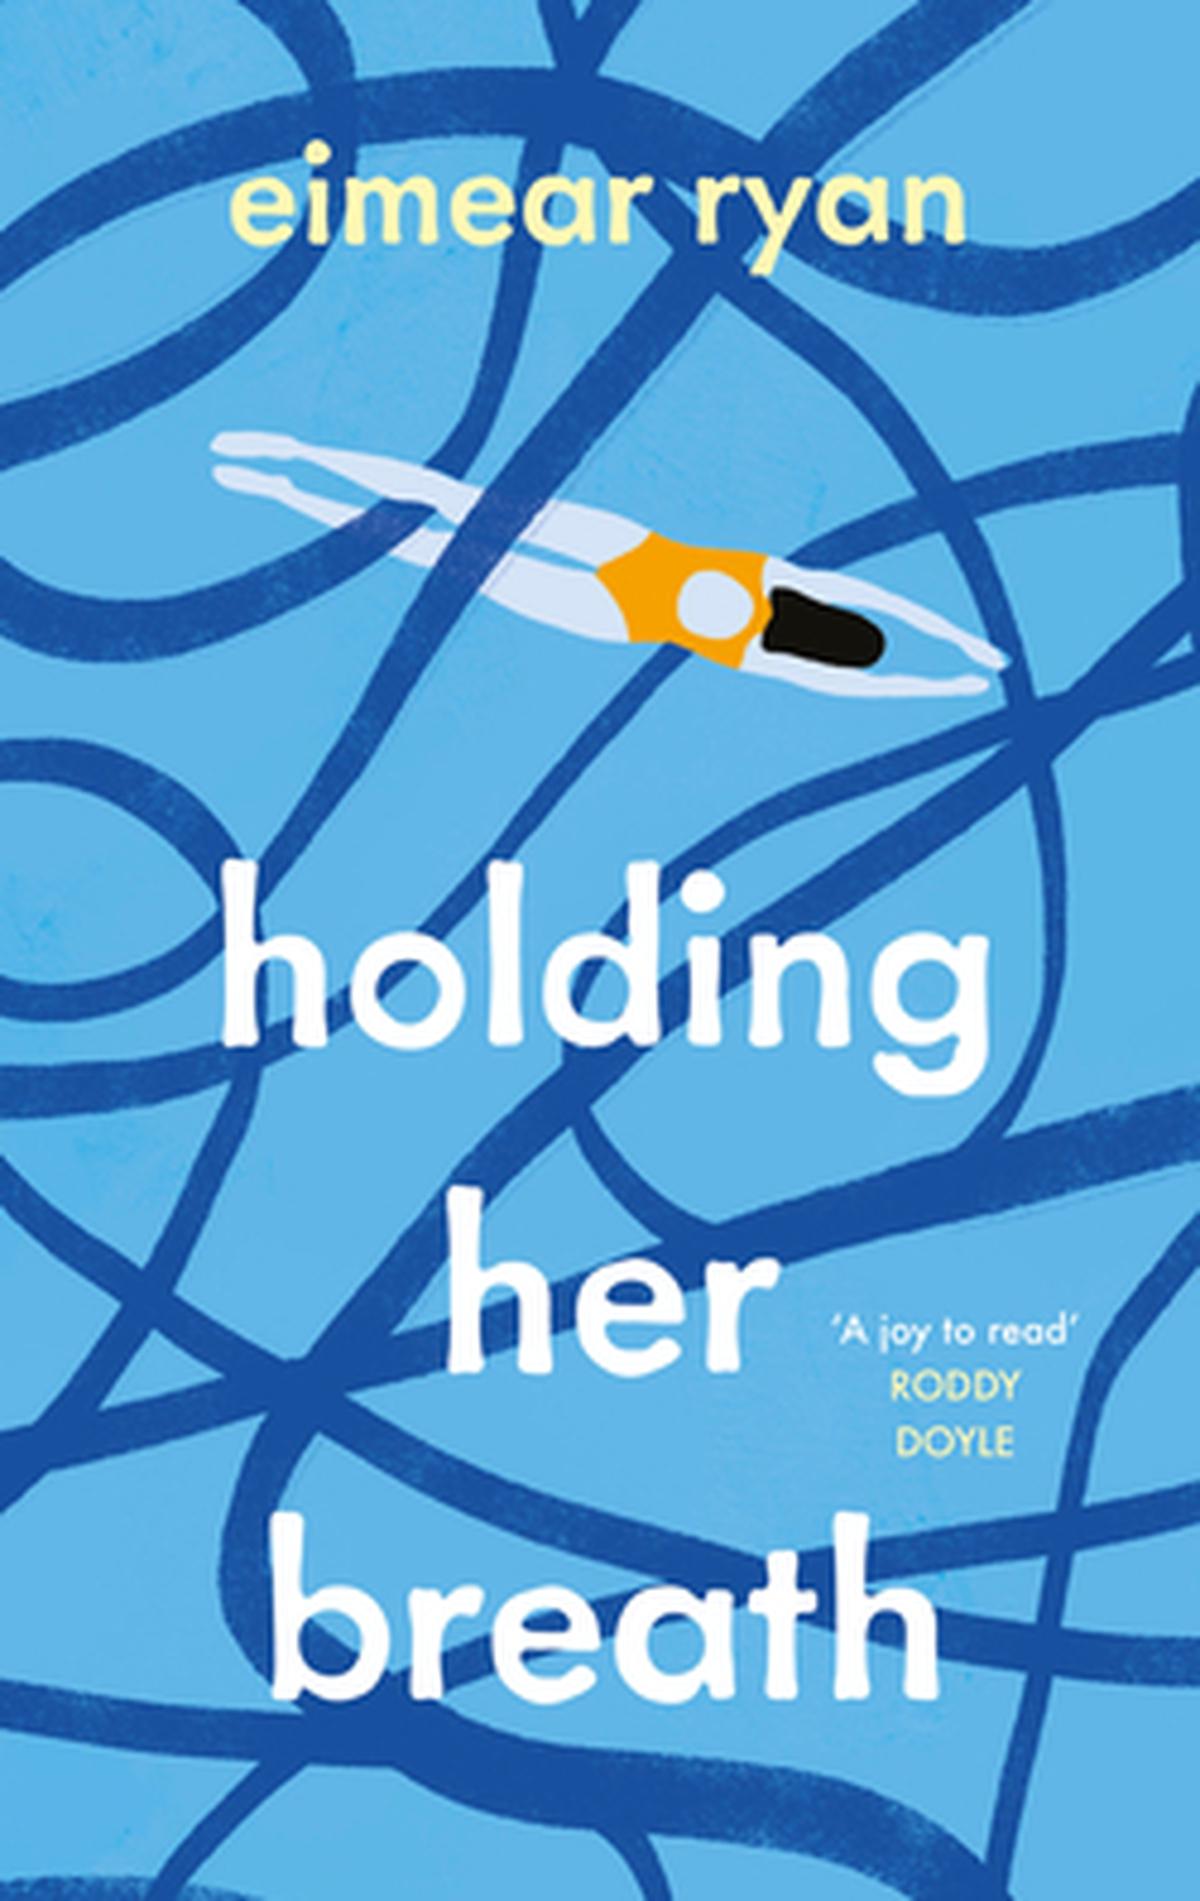 Eimear Ryan, author of 'Holding Her Breath'